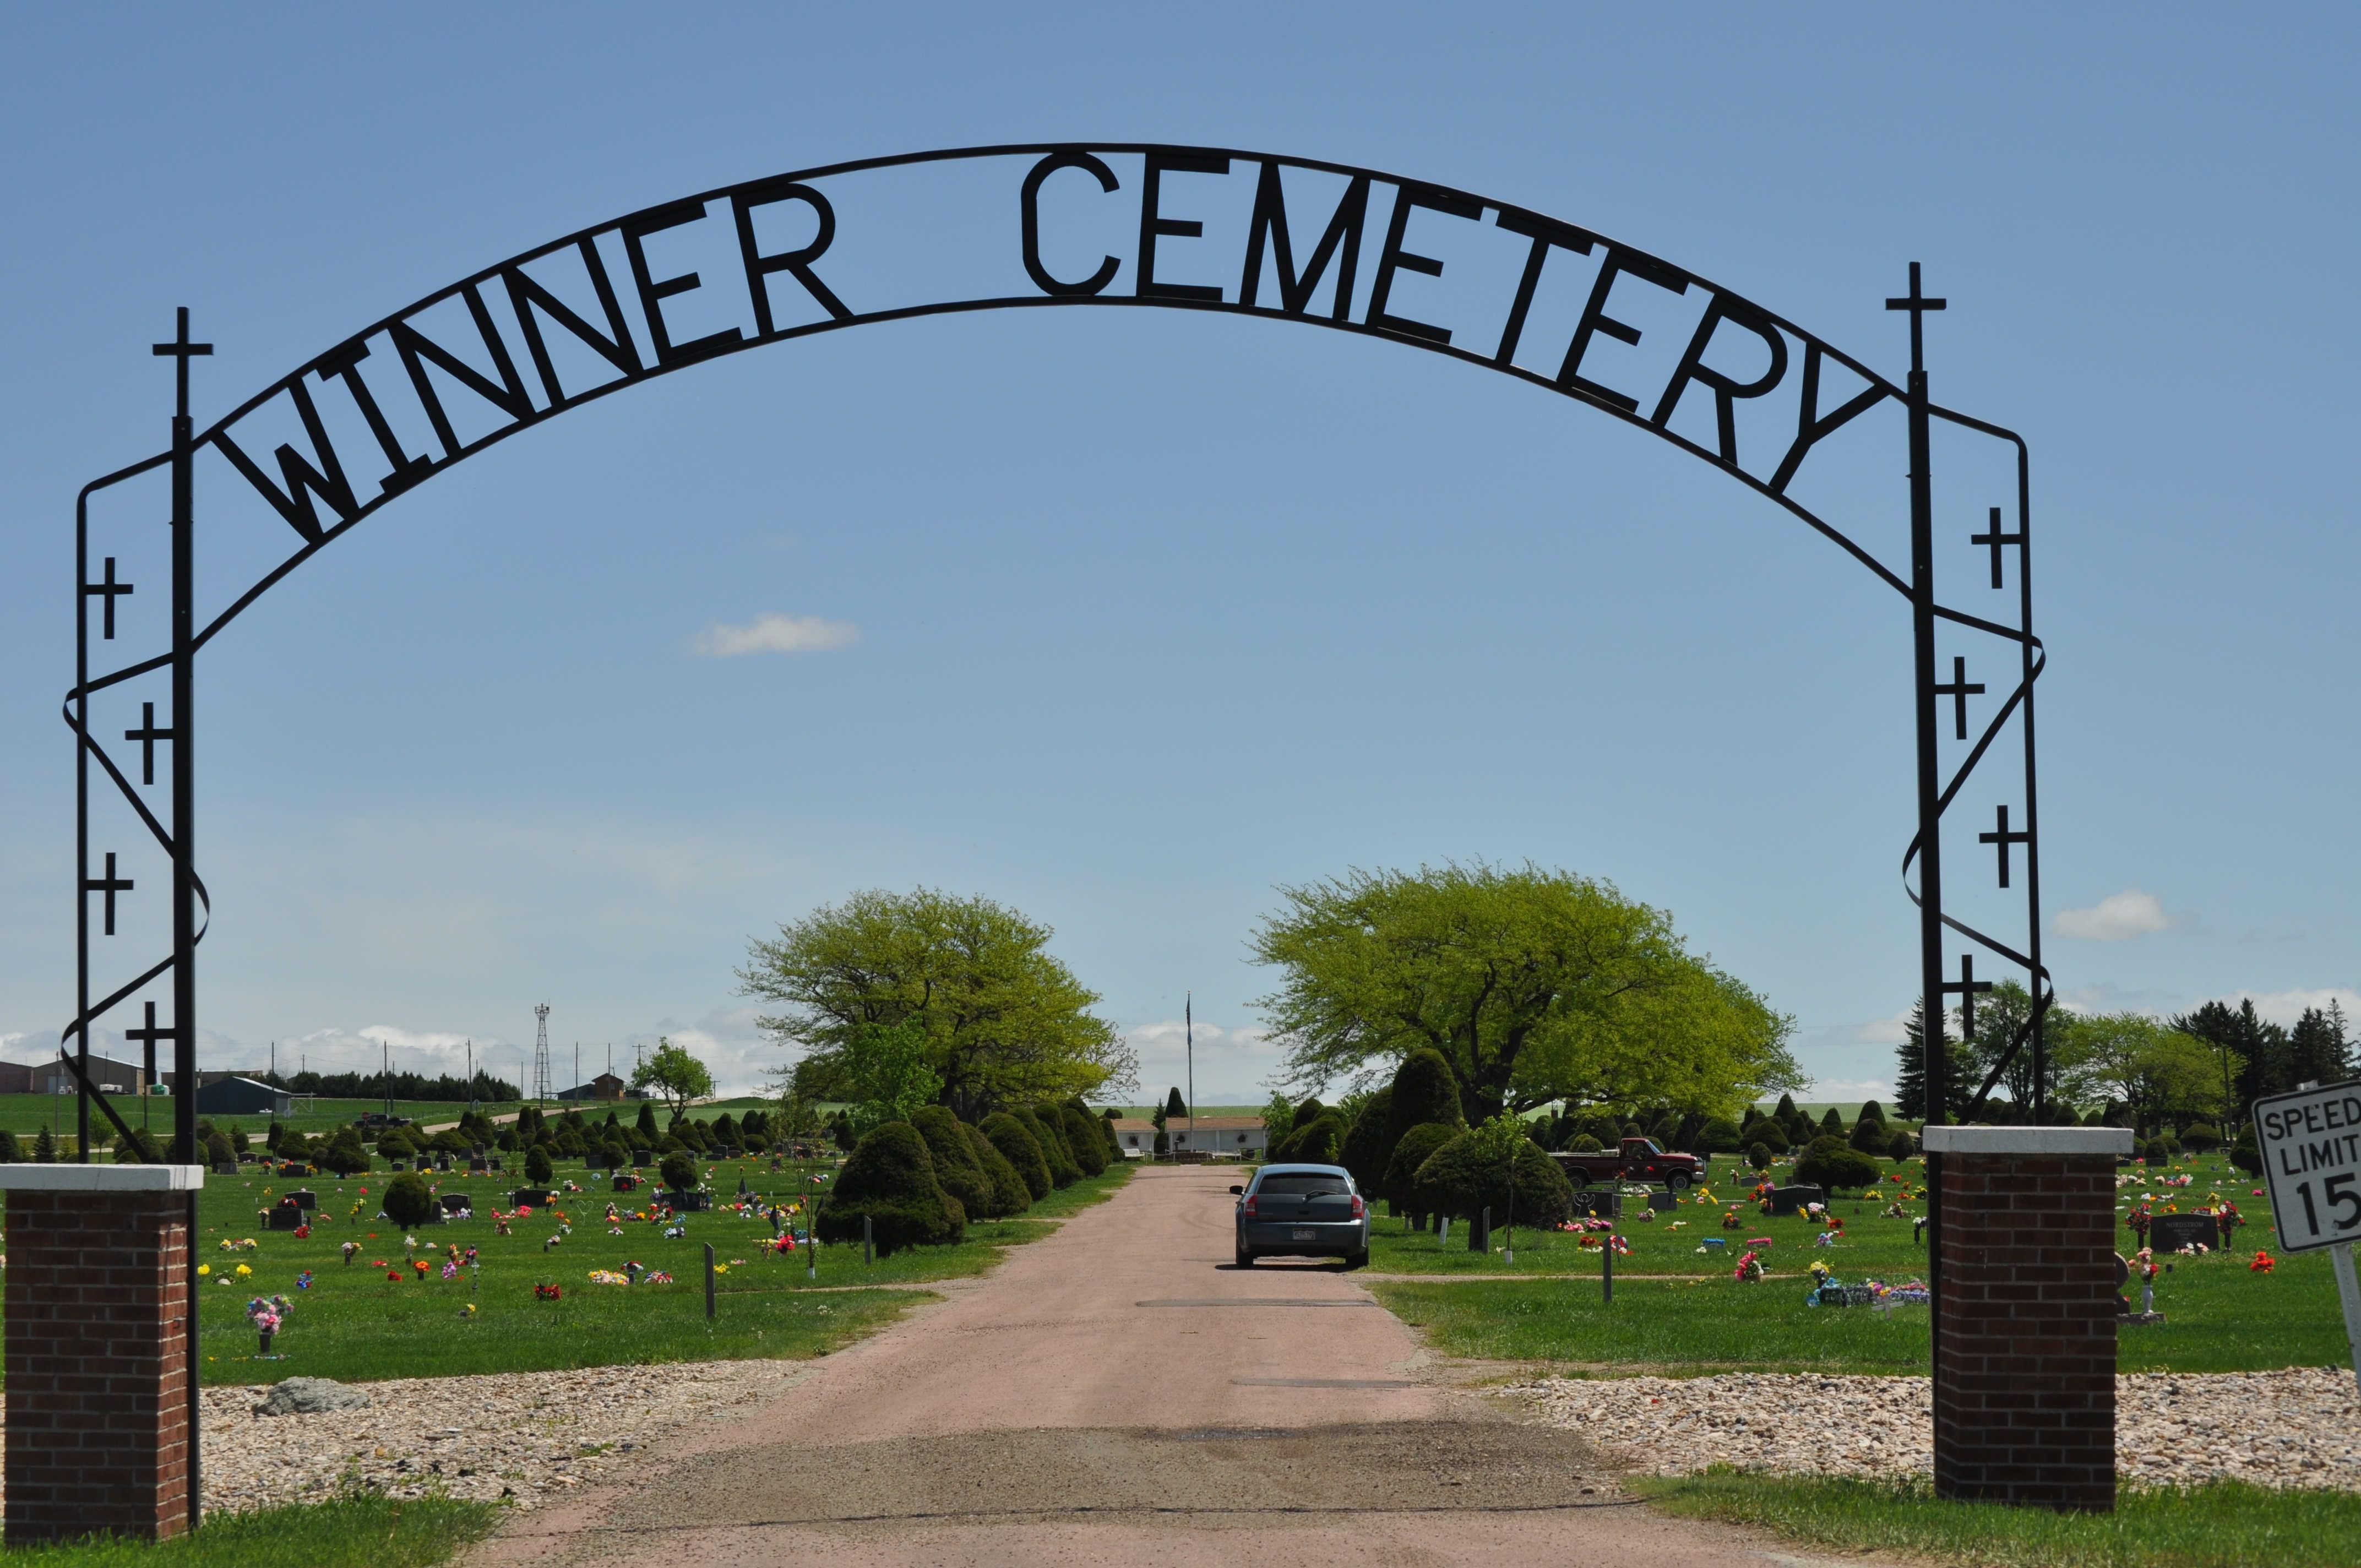 Winner City Cemetery